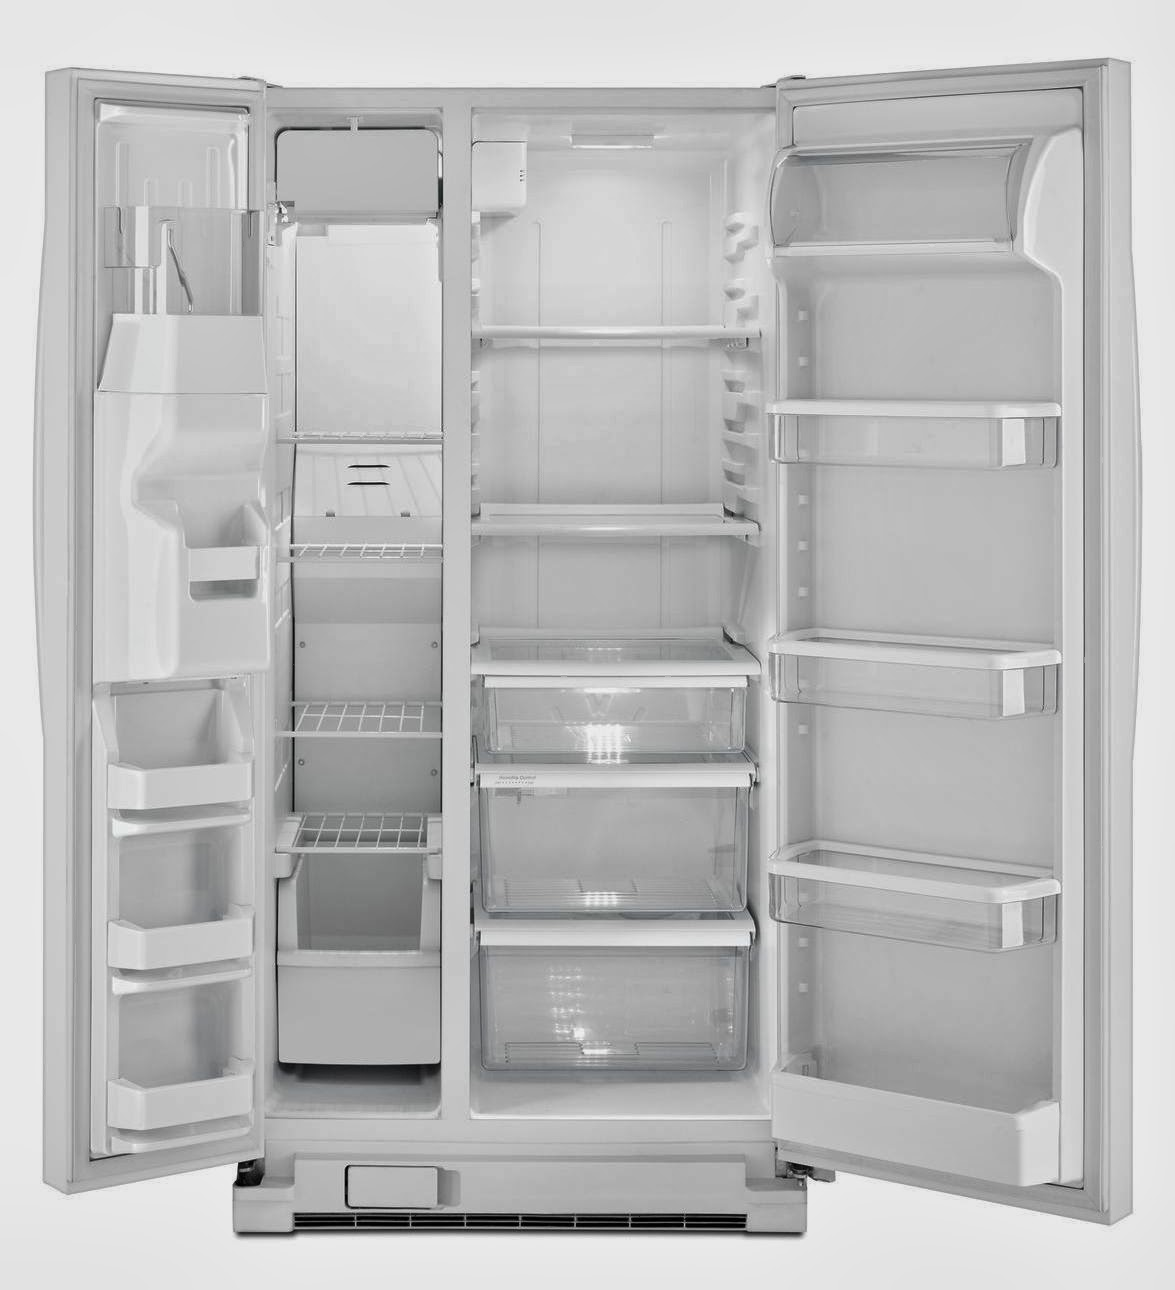 Whirlpool Refrigerator Brand Whirlpool Wrs342fiam